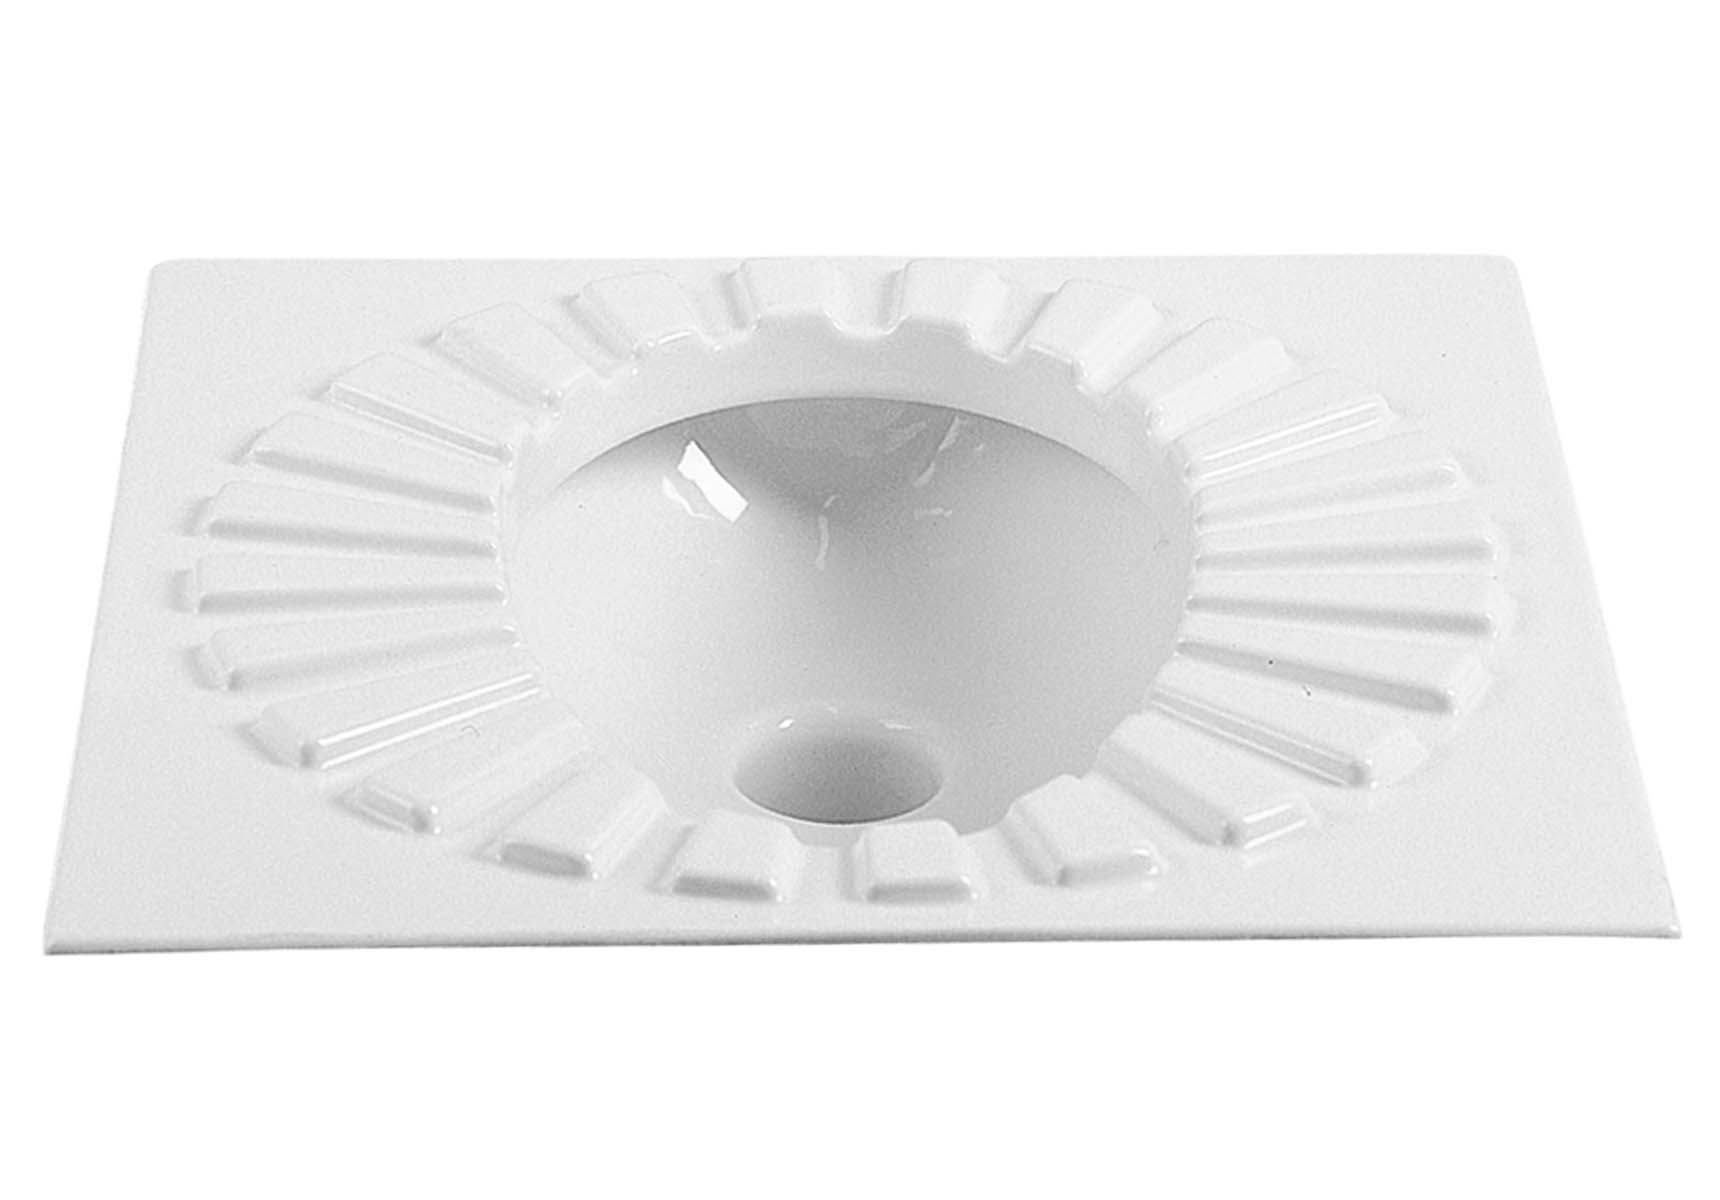 Artkitekt Squatting Pan, 50x50 cm